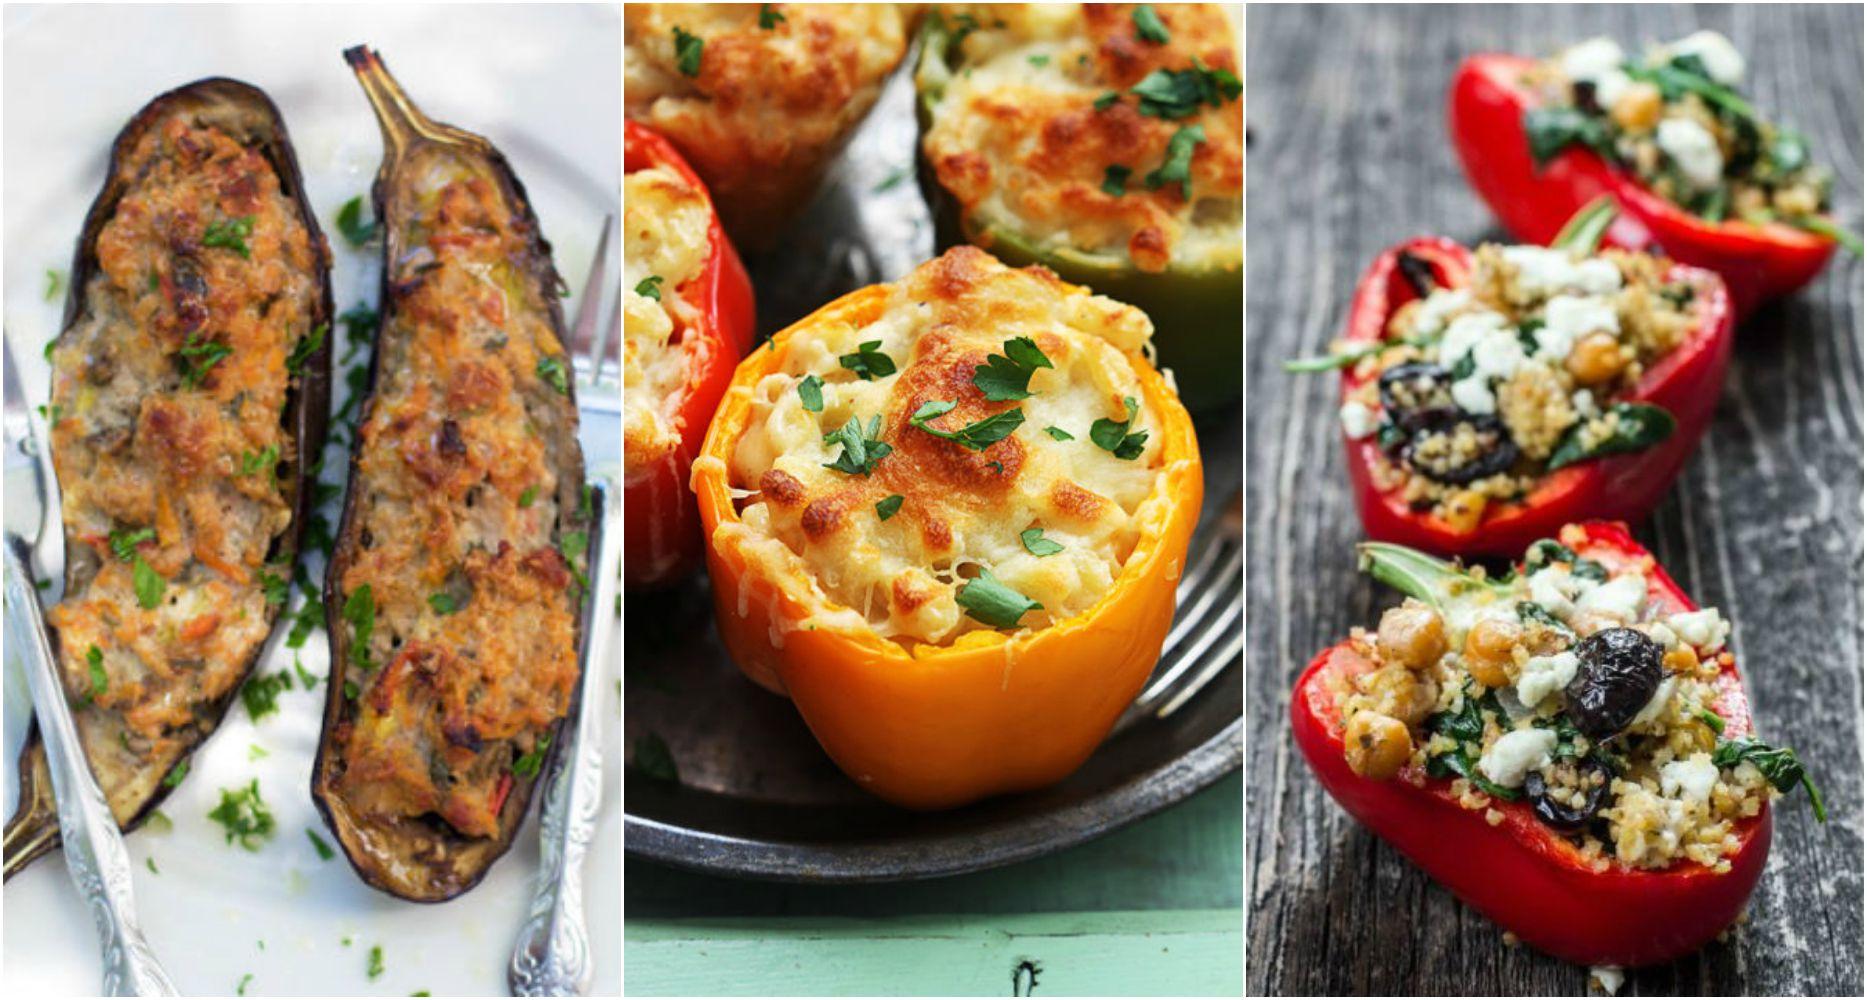 Stuffed Vegetable Recipes